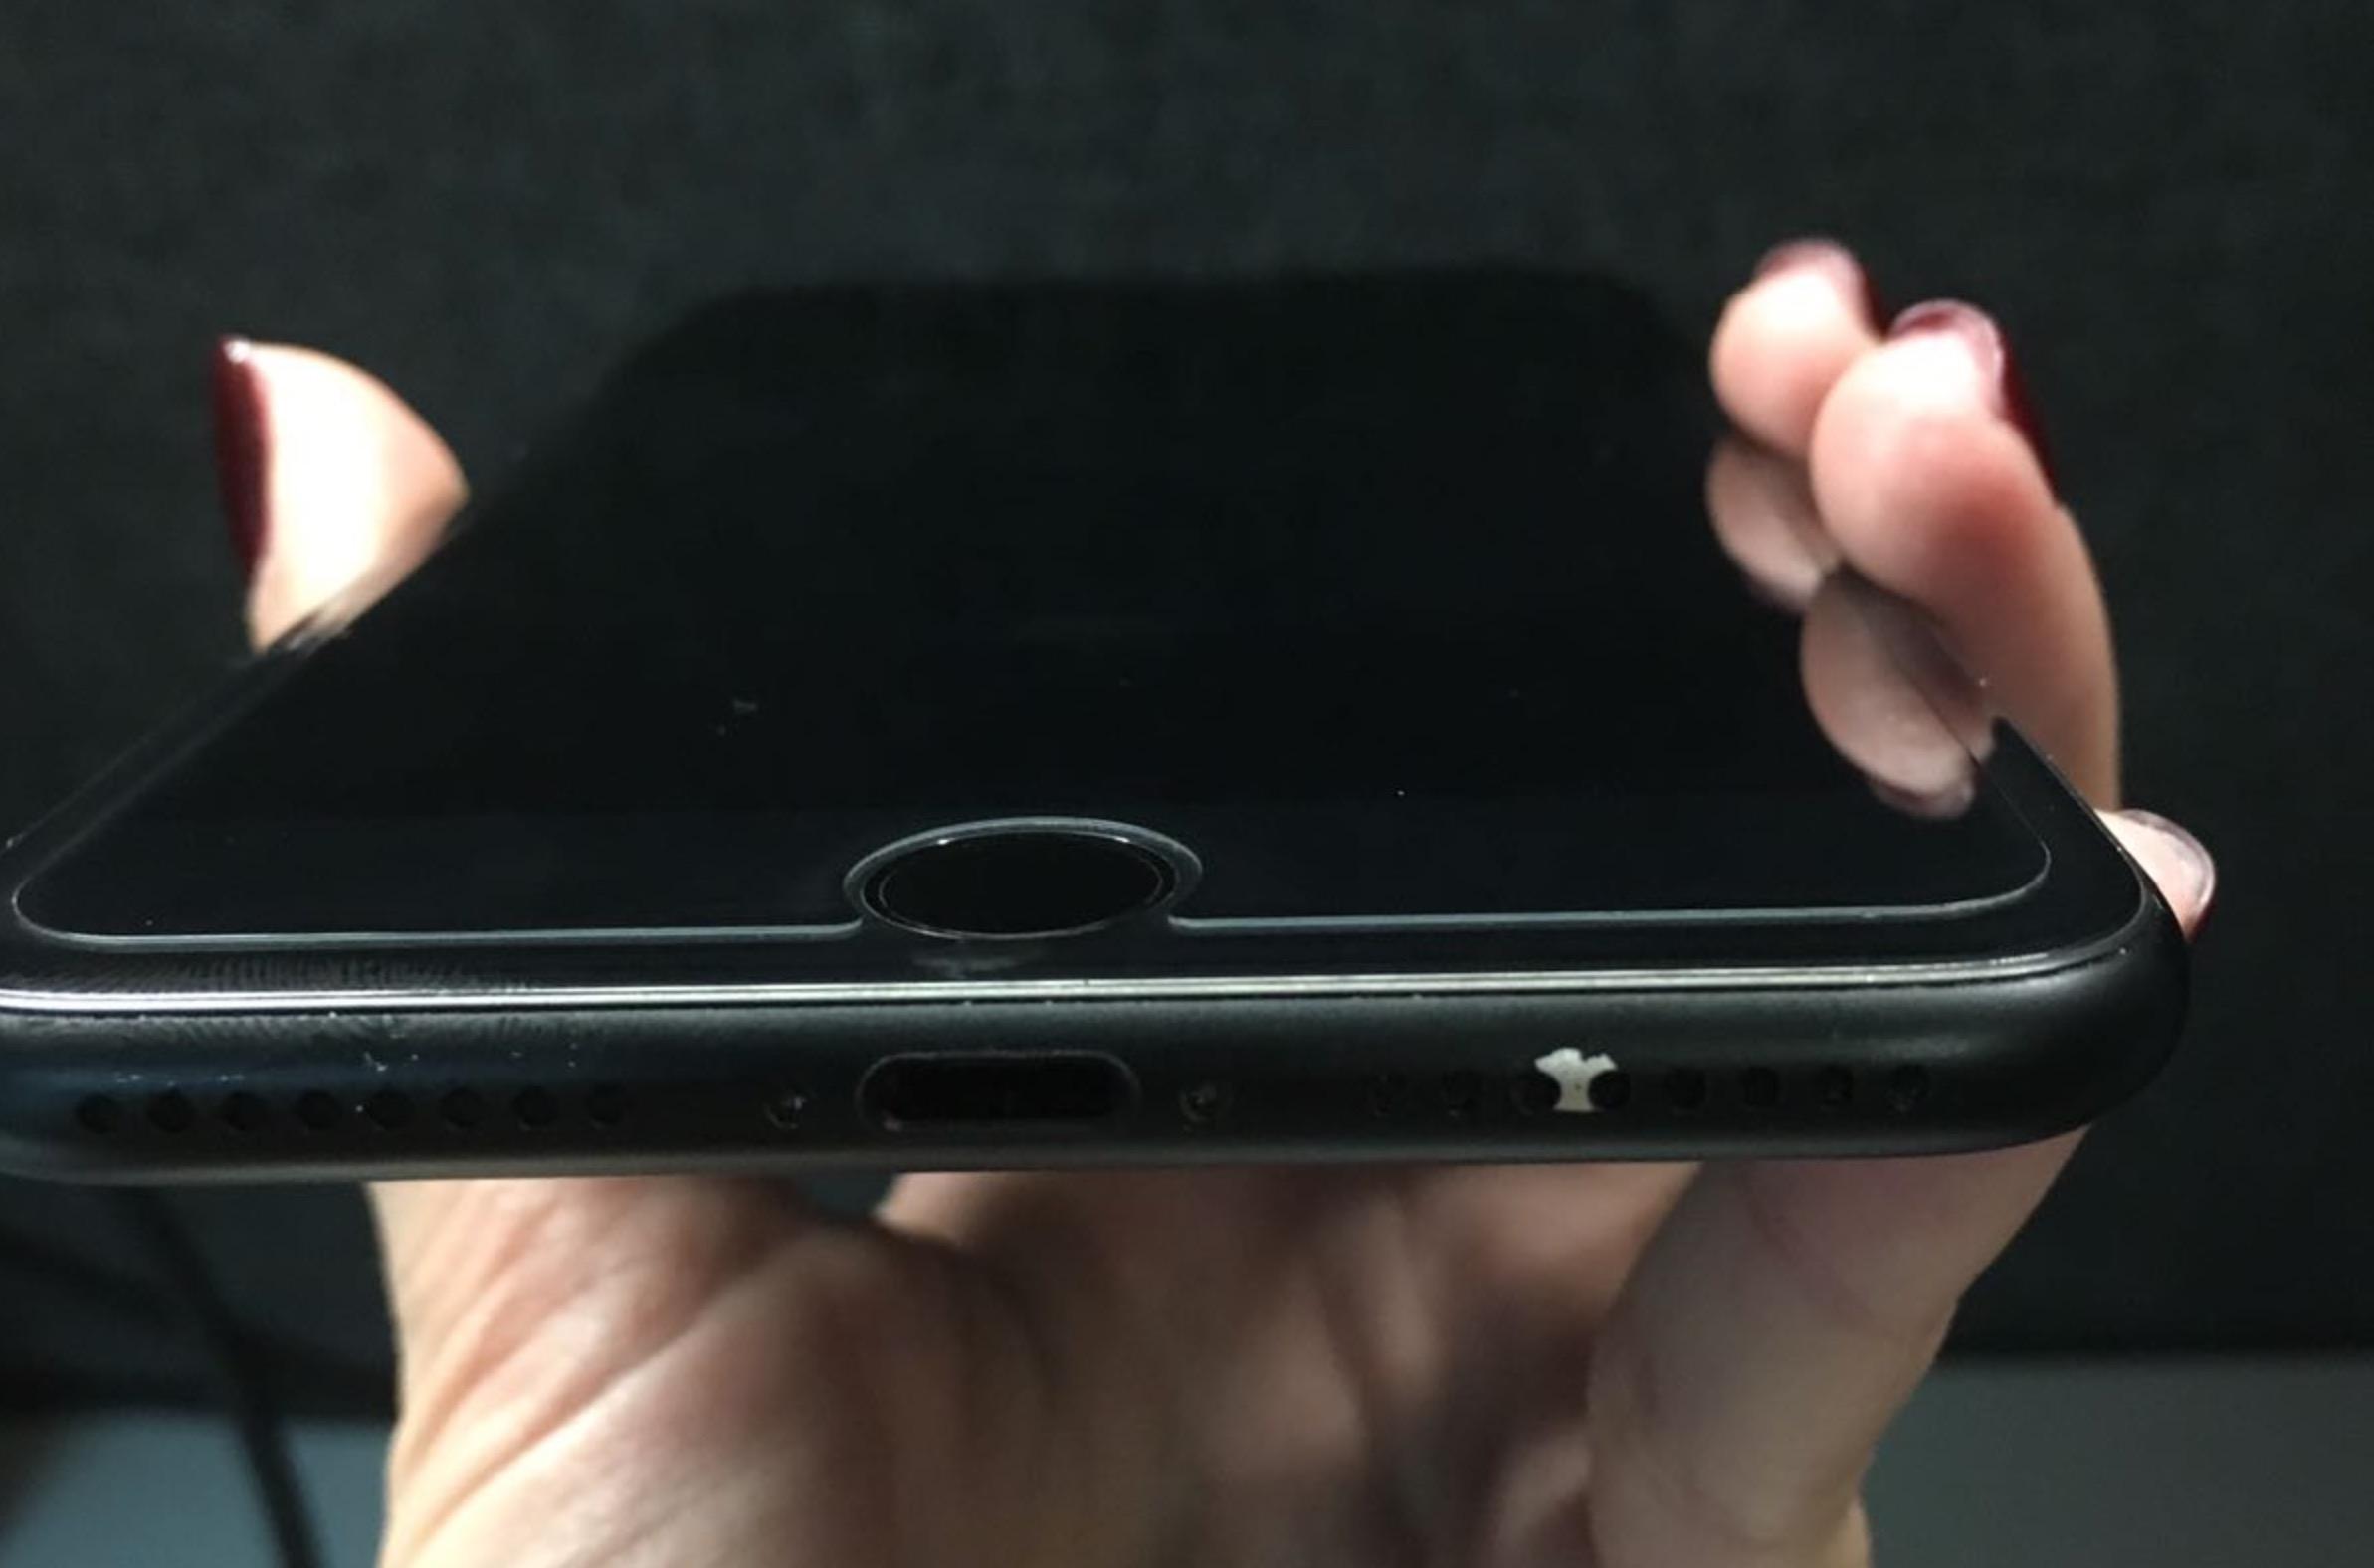 iPhone 7 nero opaco, difetti di verniciatura